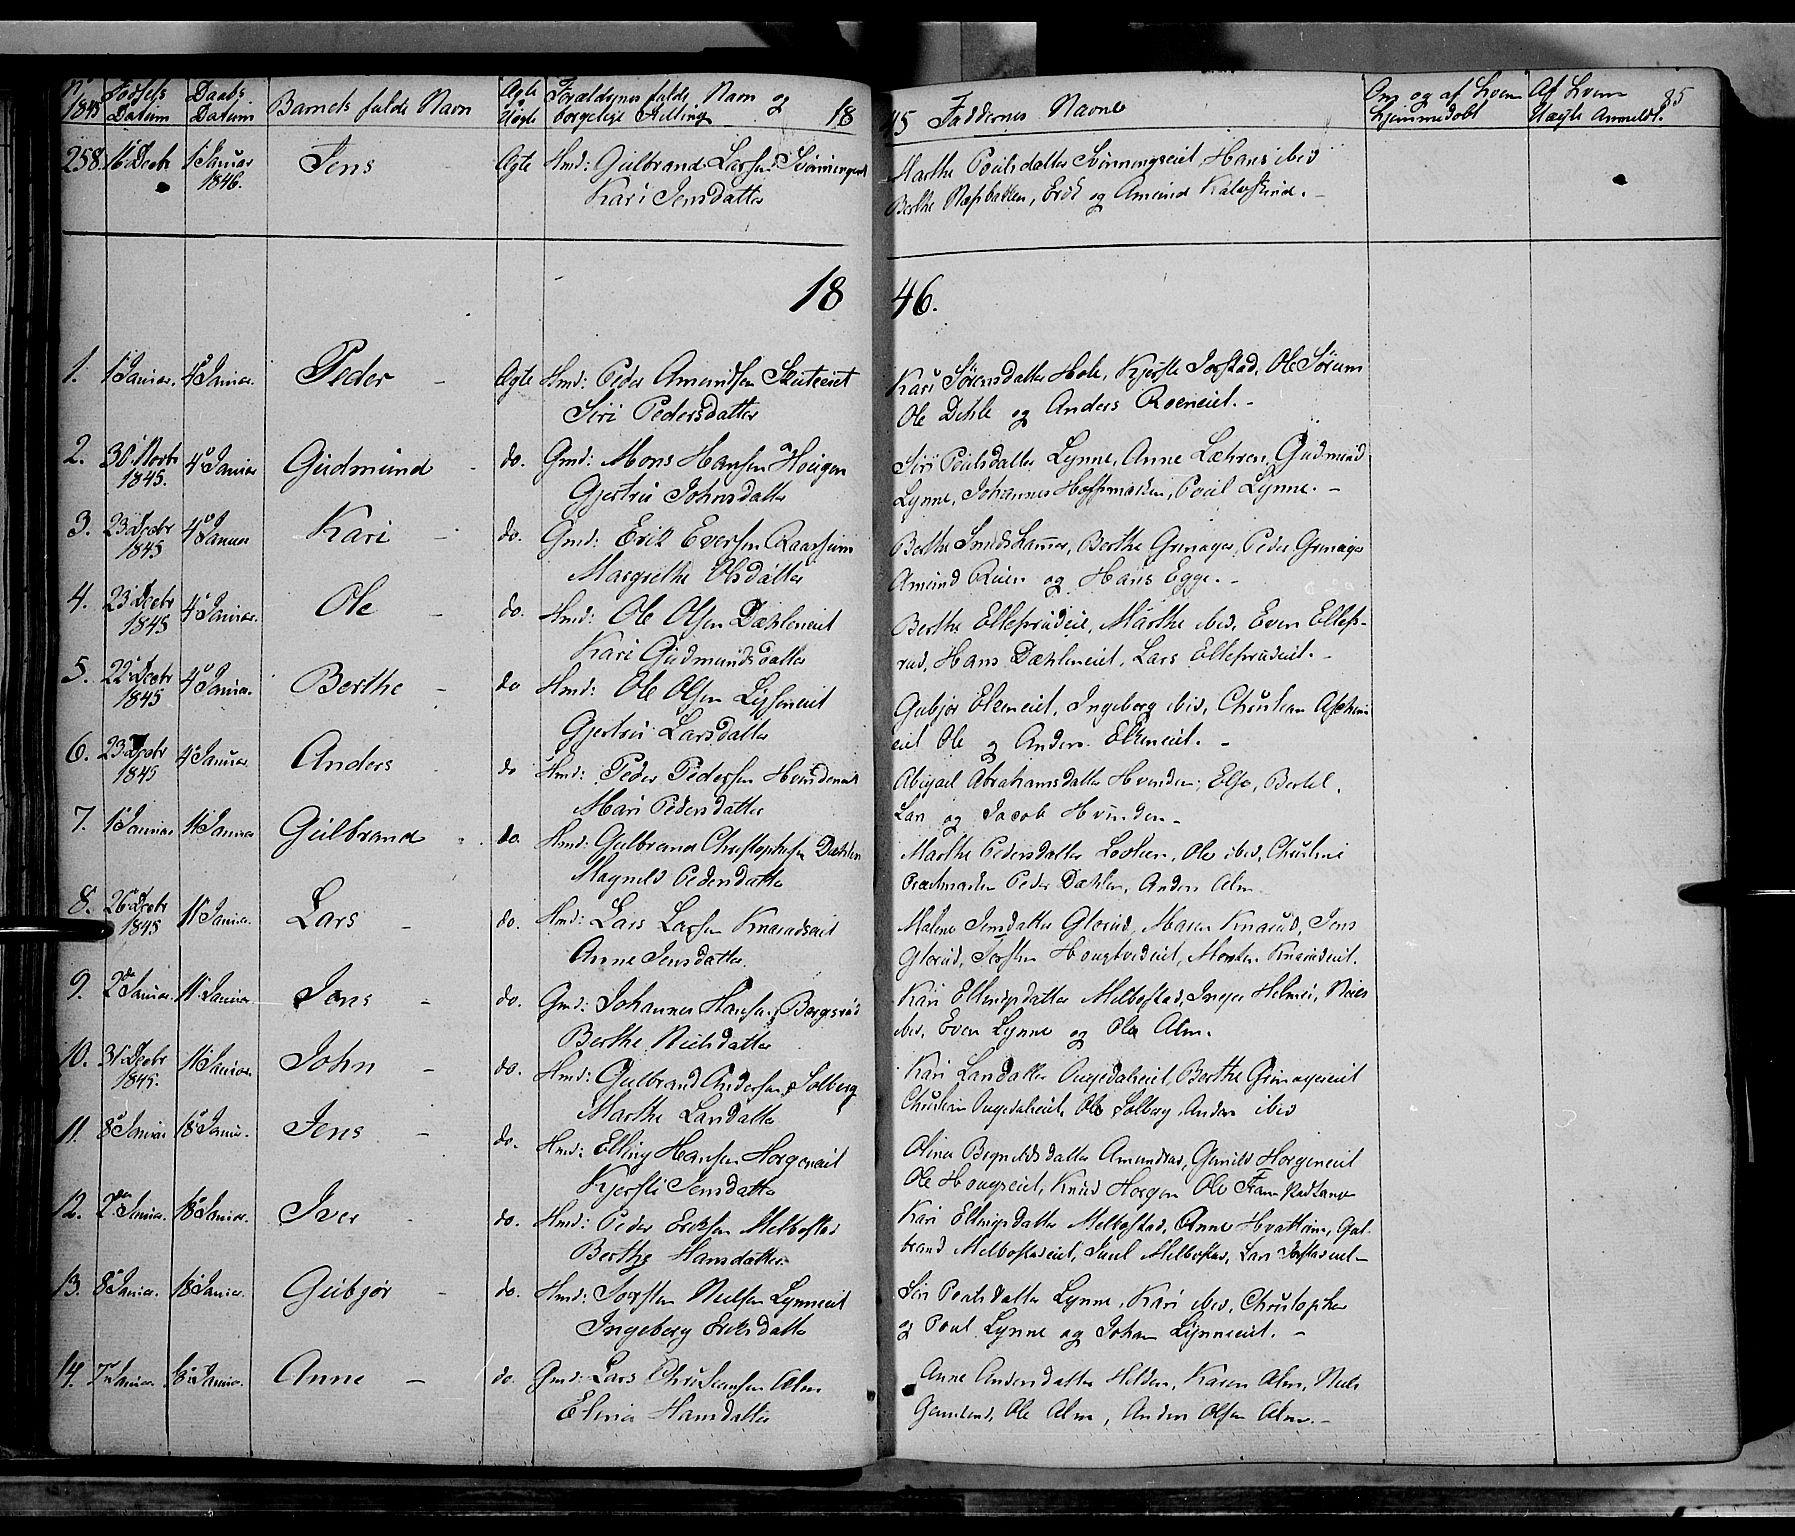 SAH, Gran prestekontor, Ministerialbok nr. 11, 1842-1856, s. 84-85